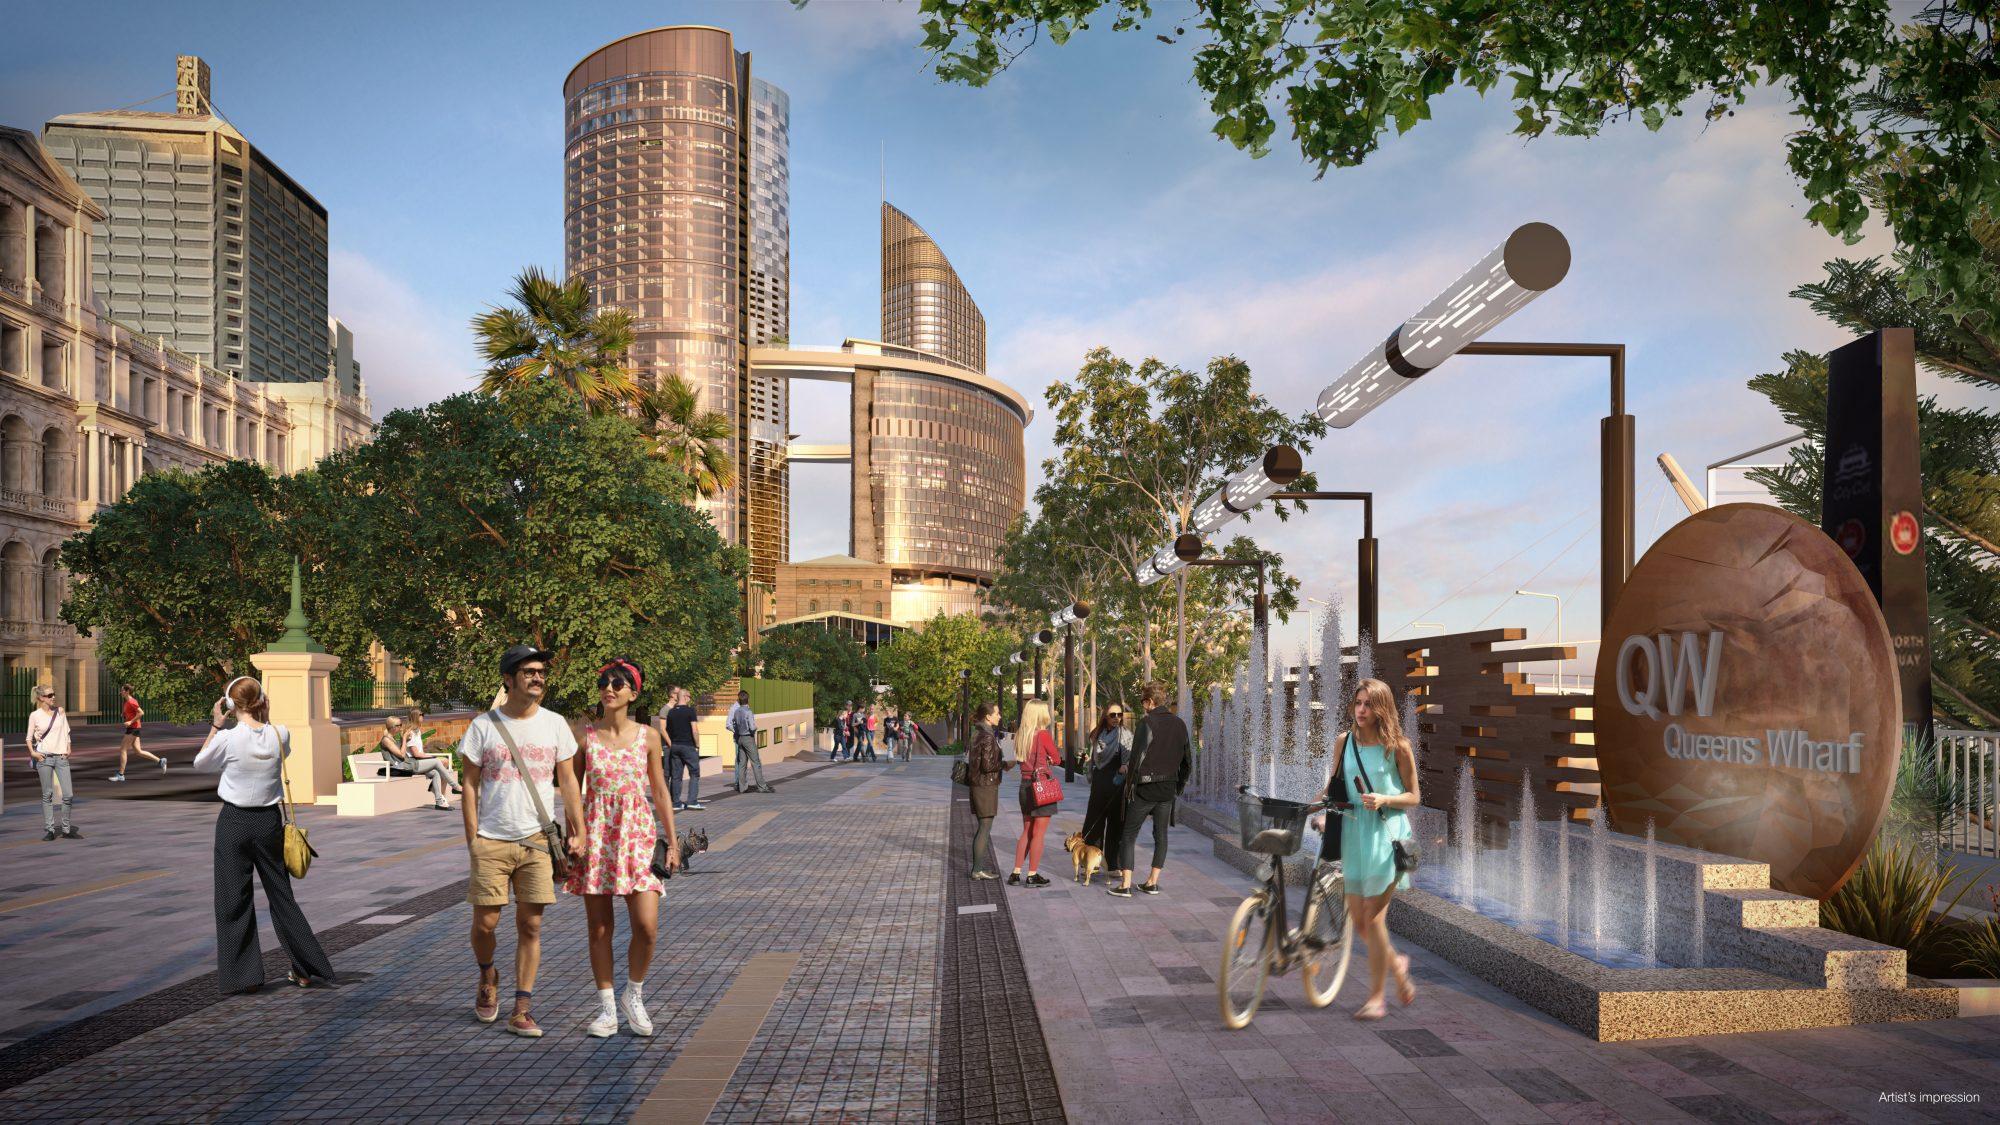 Australia's Queen's Wharf takes shape with Nemetschek AEC software